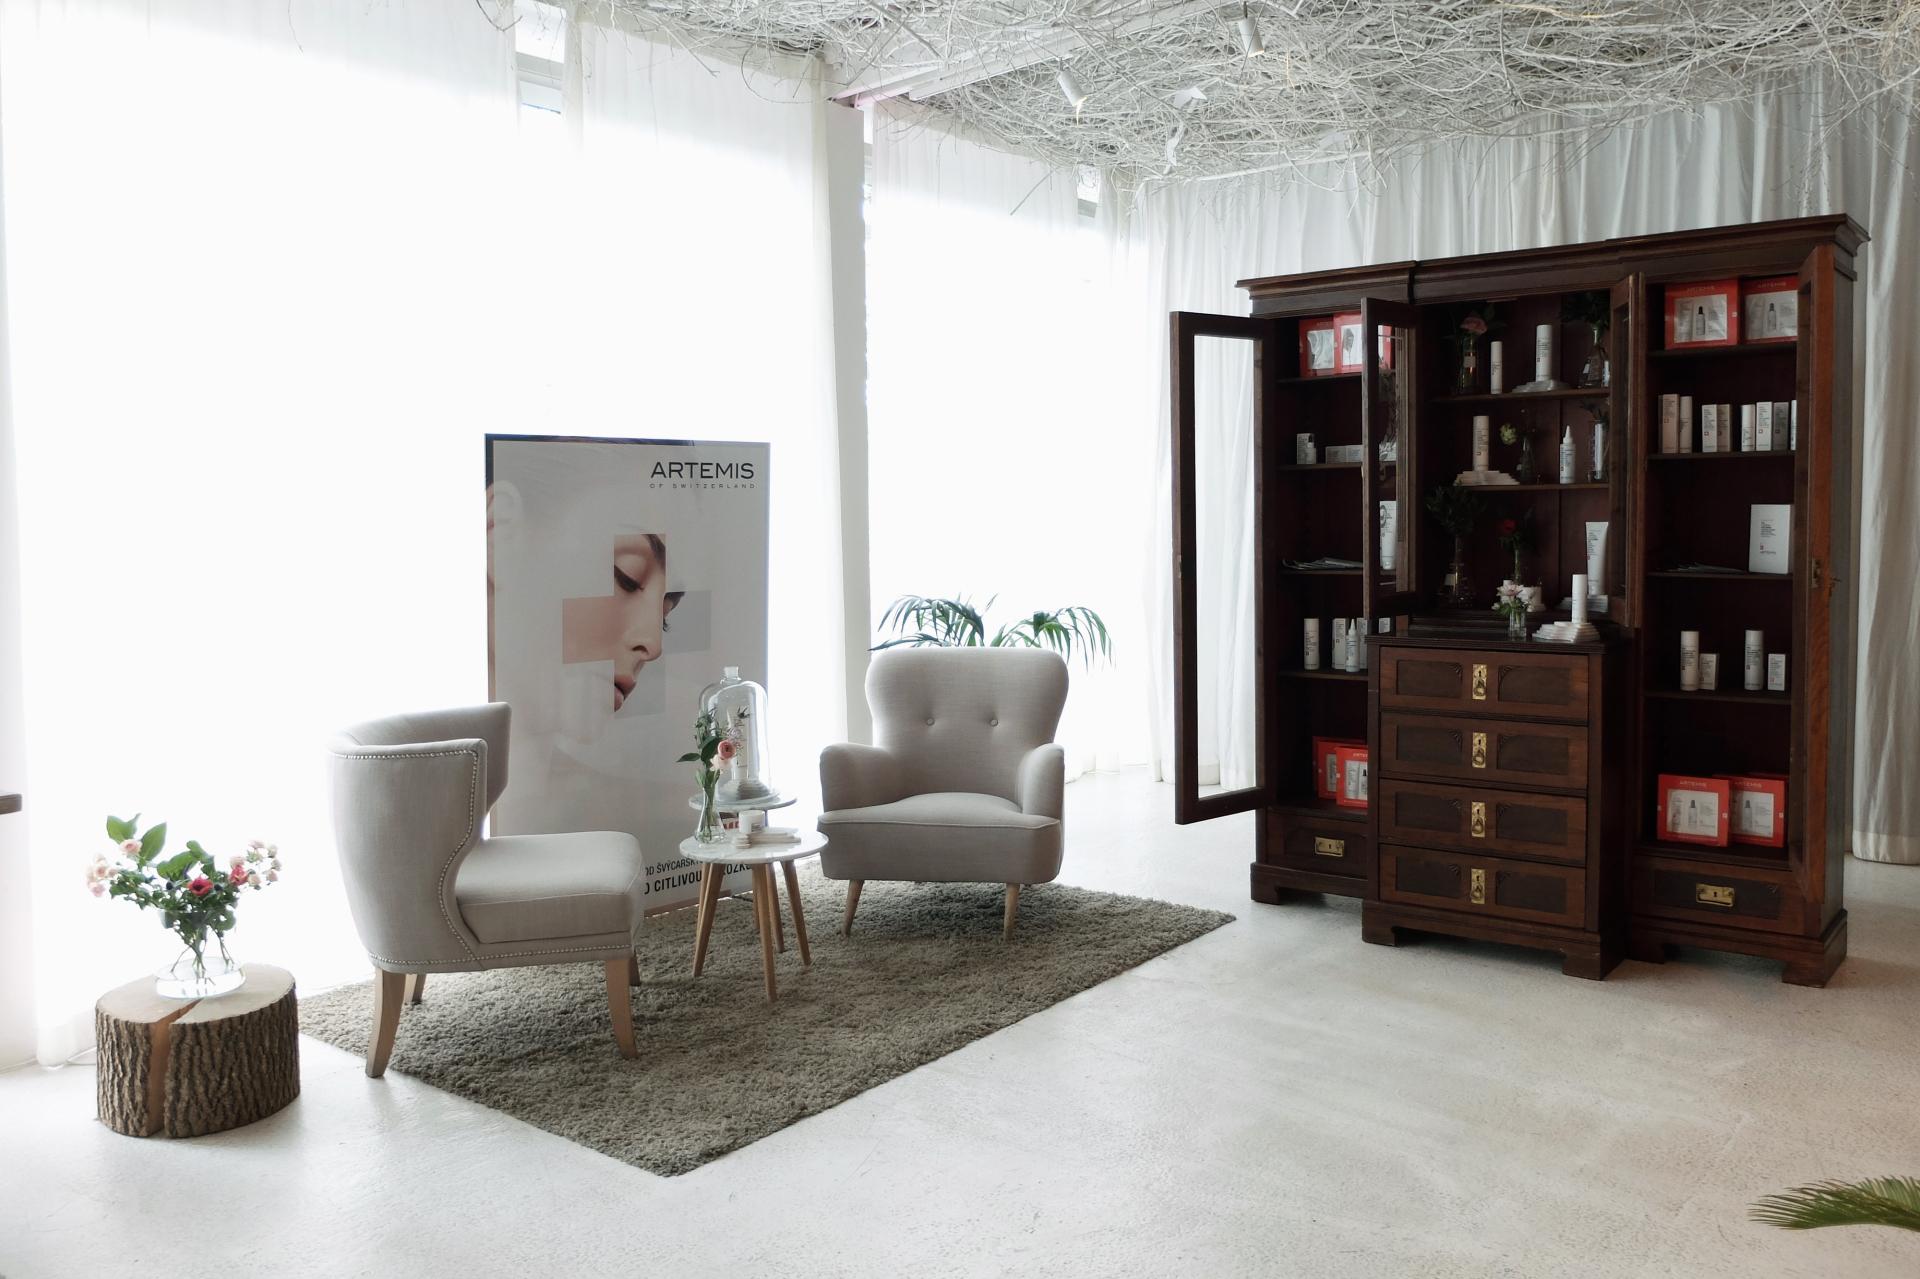 Denisa Strmiskova Studio | spatial design ARTEMIS